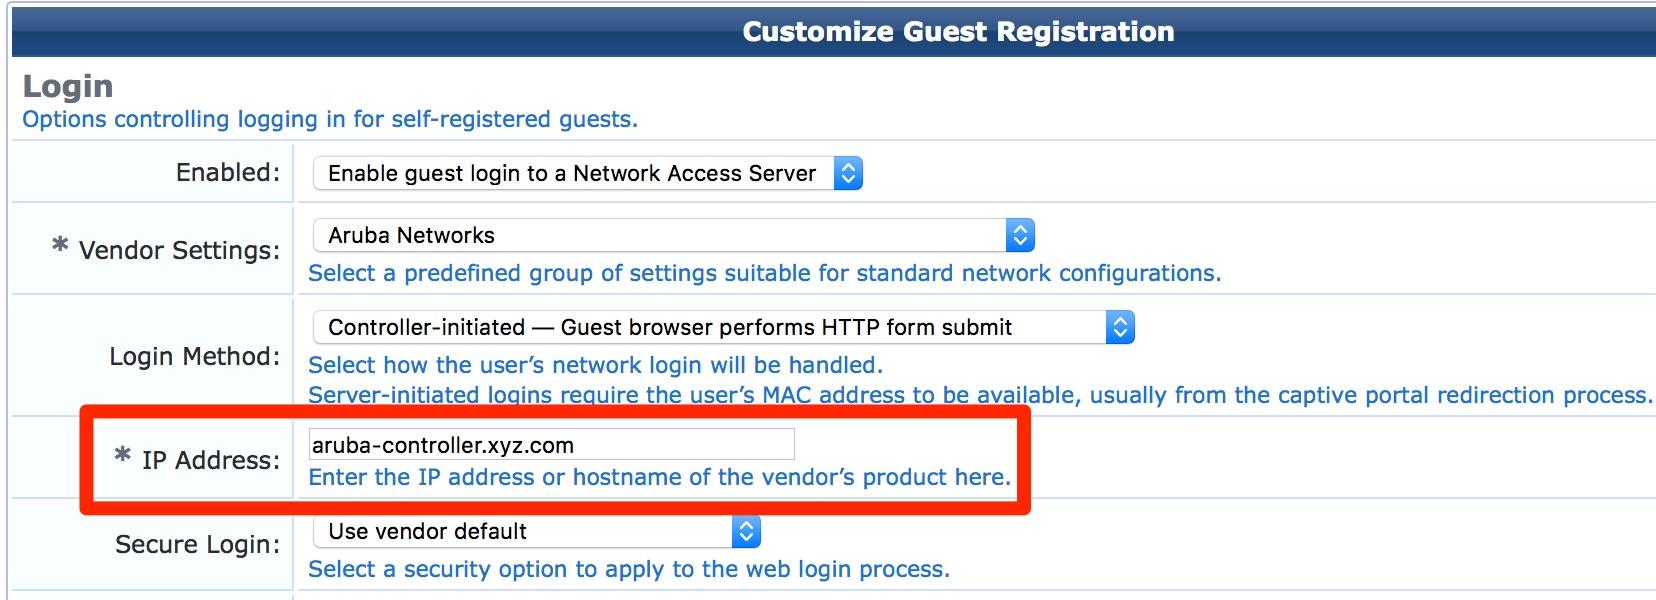 customize_guest_registration_common_prs07RP.jpg